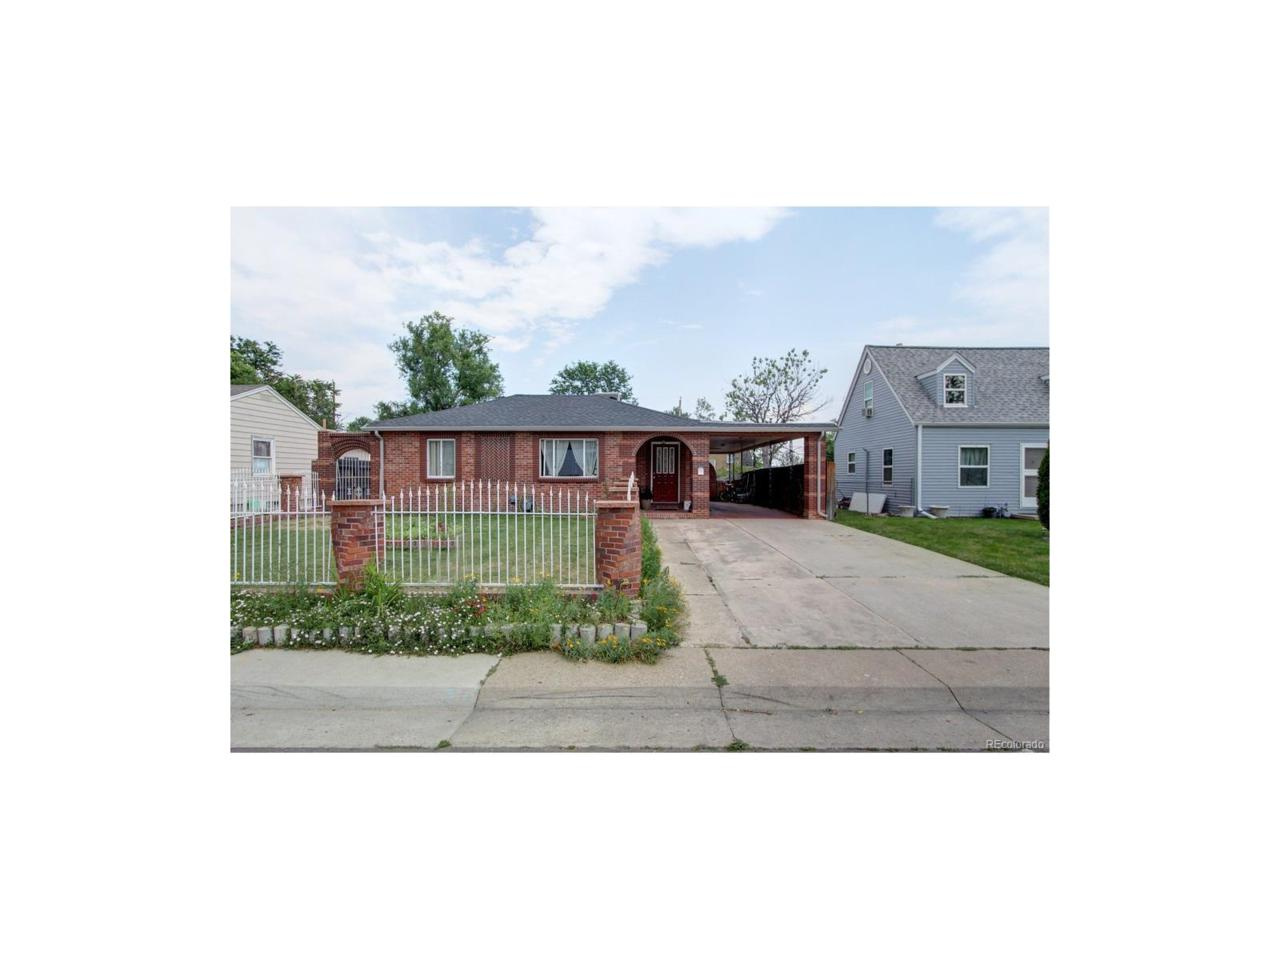 4870 Raritan Street, Denver, CO 80221 (MLS #4286193) :: 8z Real Estate